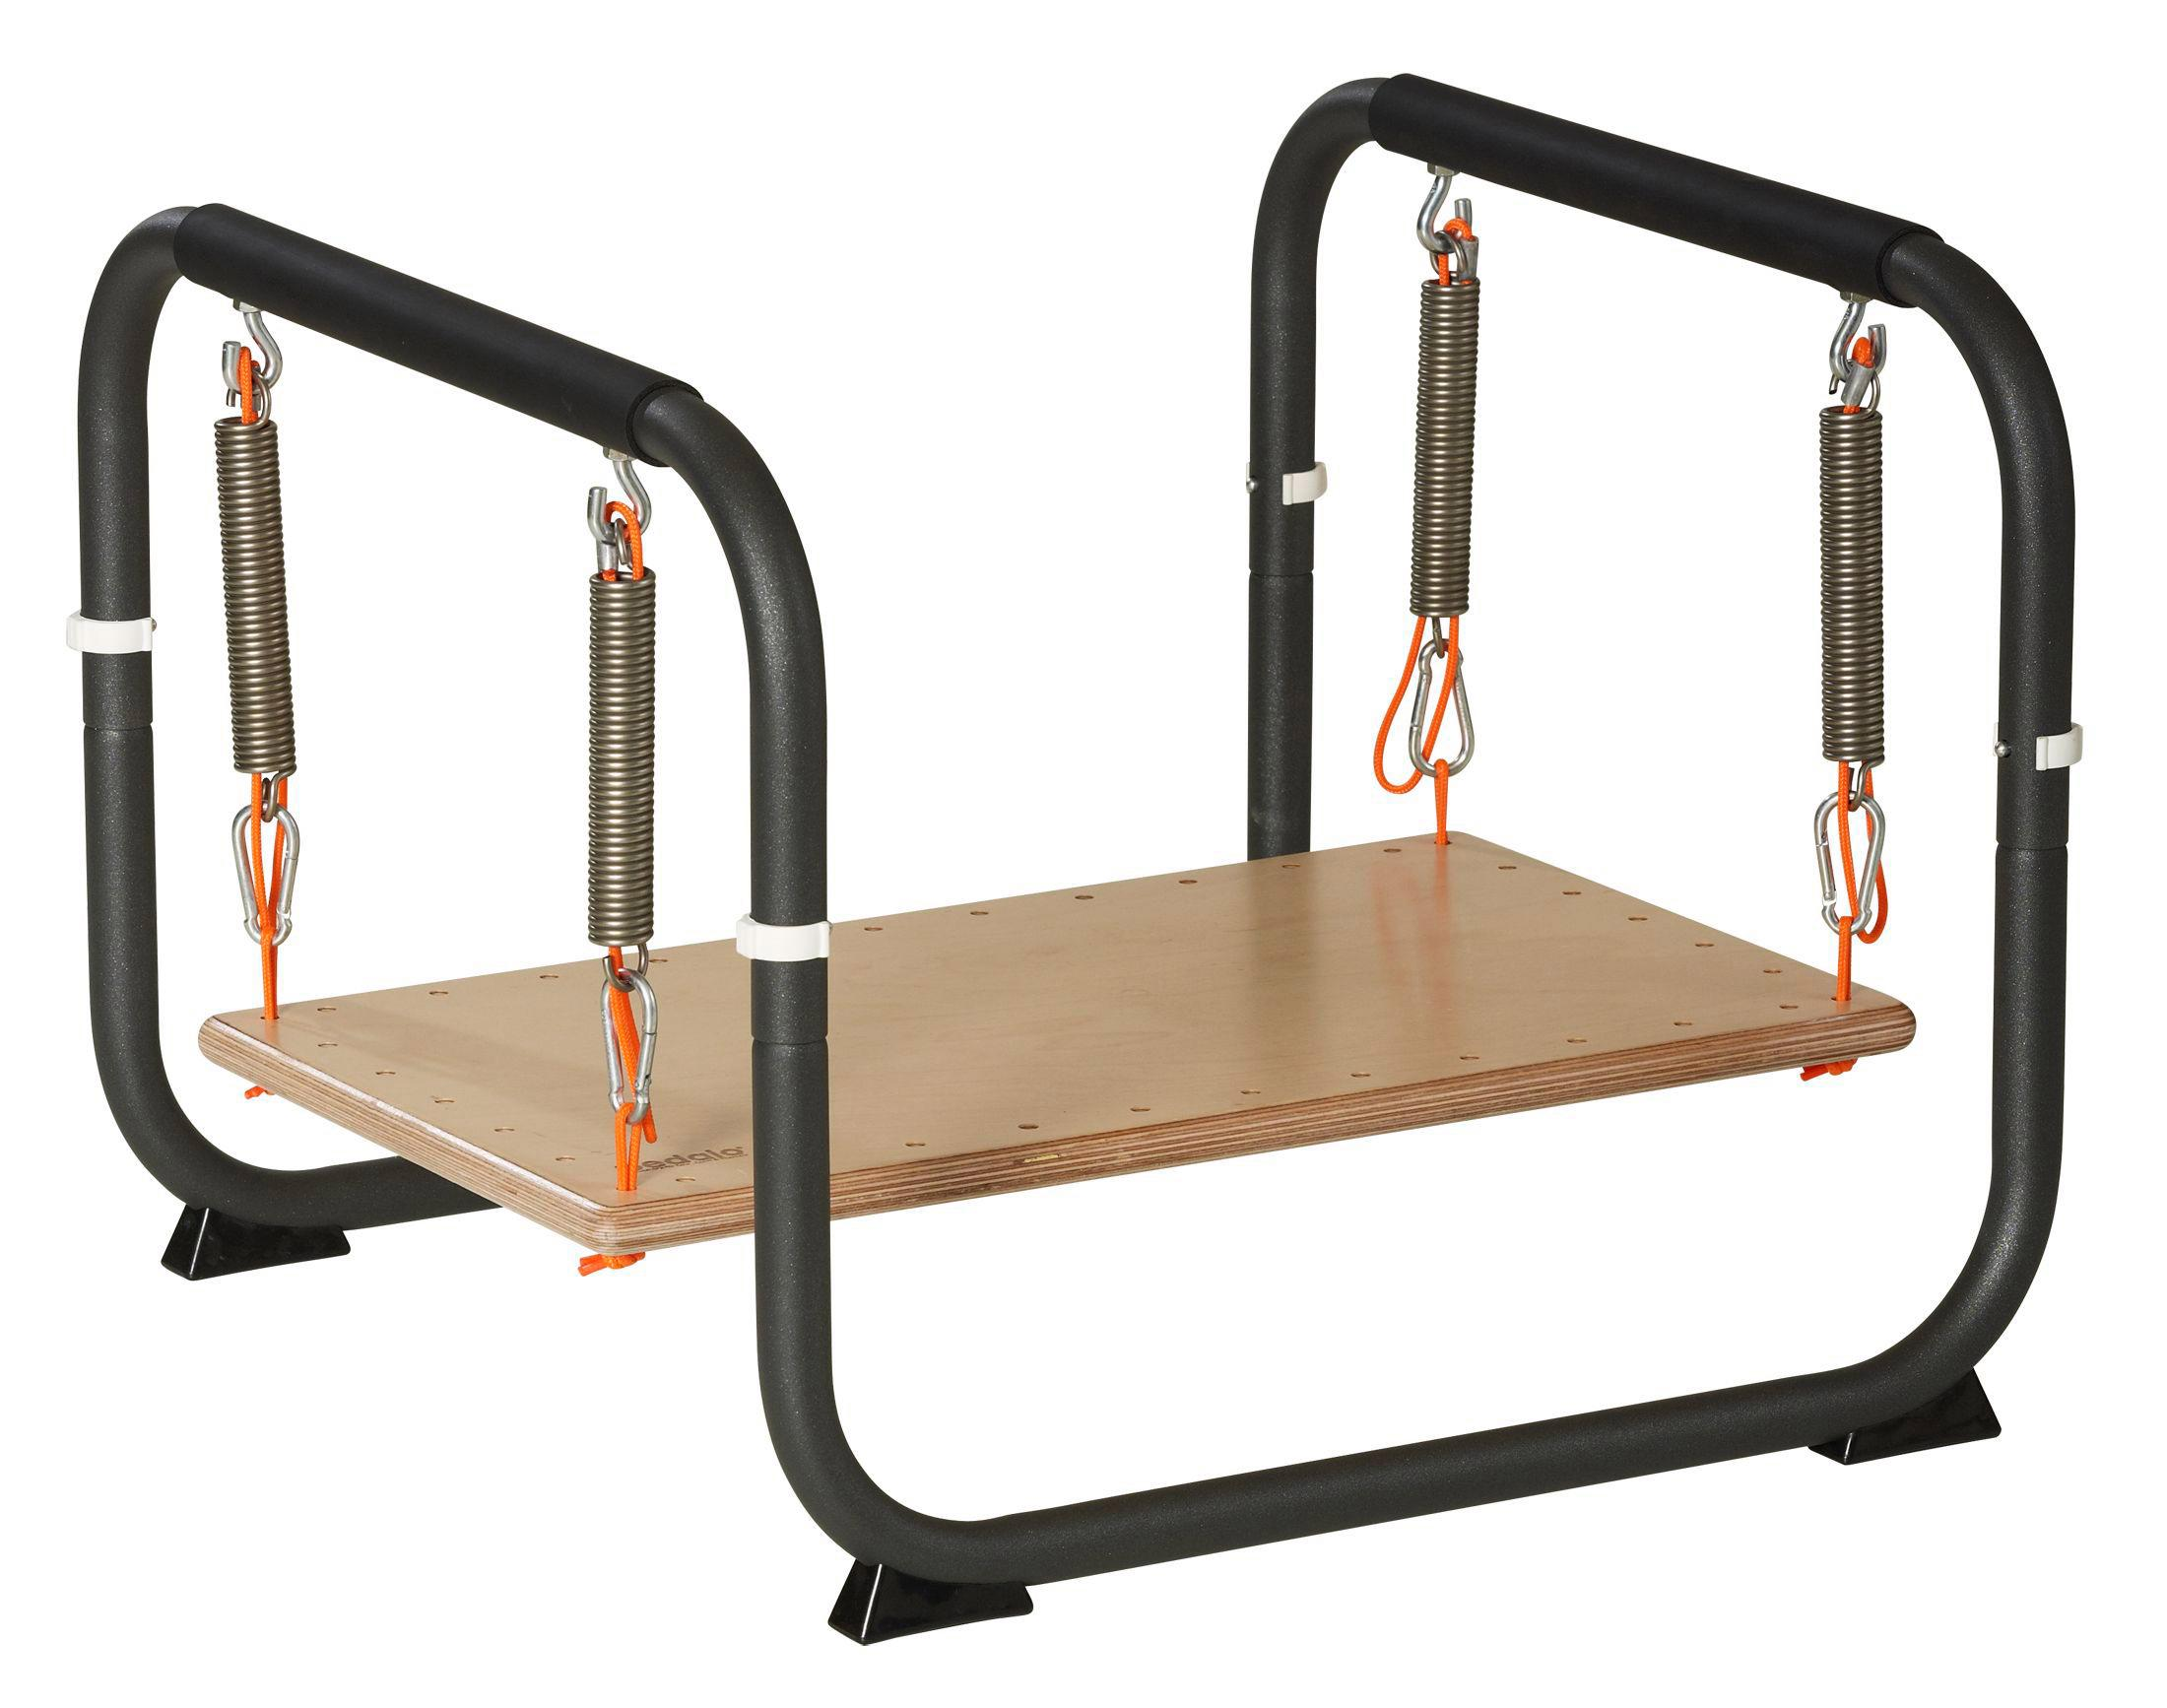 pedalo Stabilisations-Therapiegerät Pedalo Stabilisator Sport bunt Fitness Ausrüstung Sportarten Balancetrainer